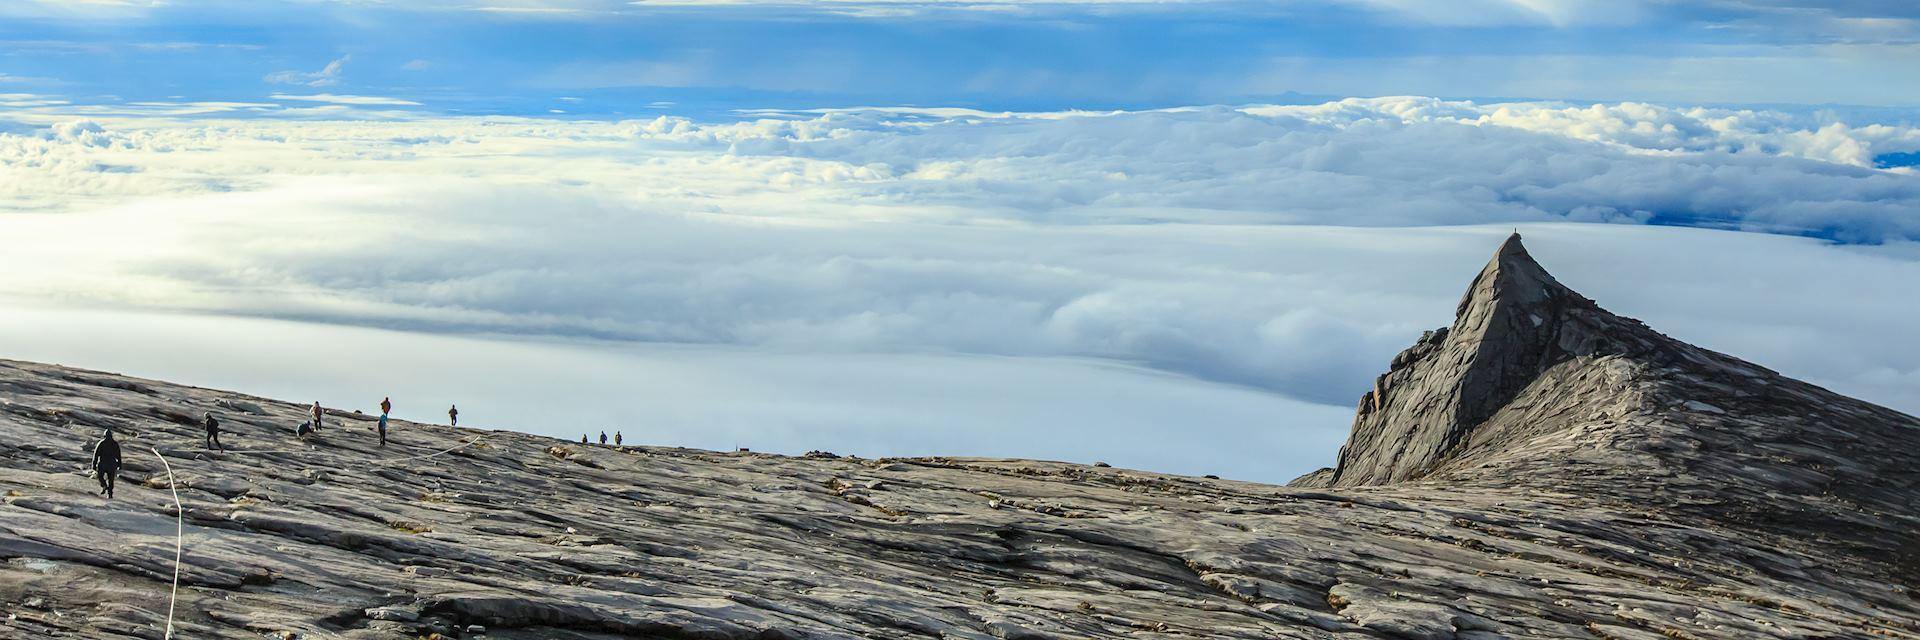 Climbing Mount Kinabalu, Borneo